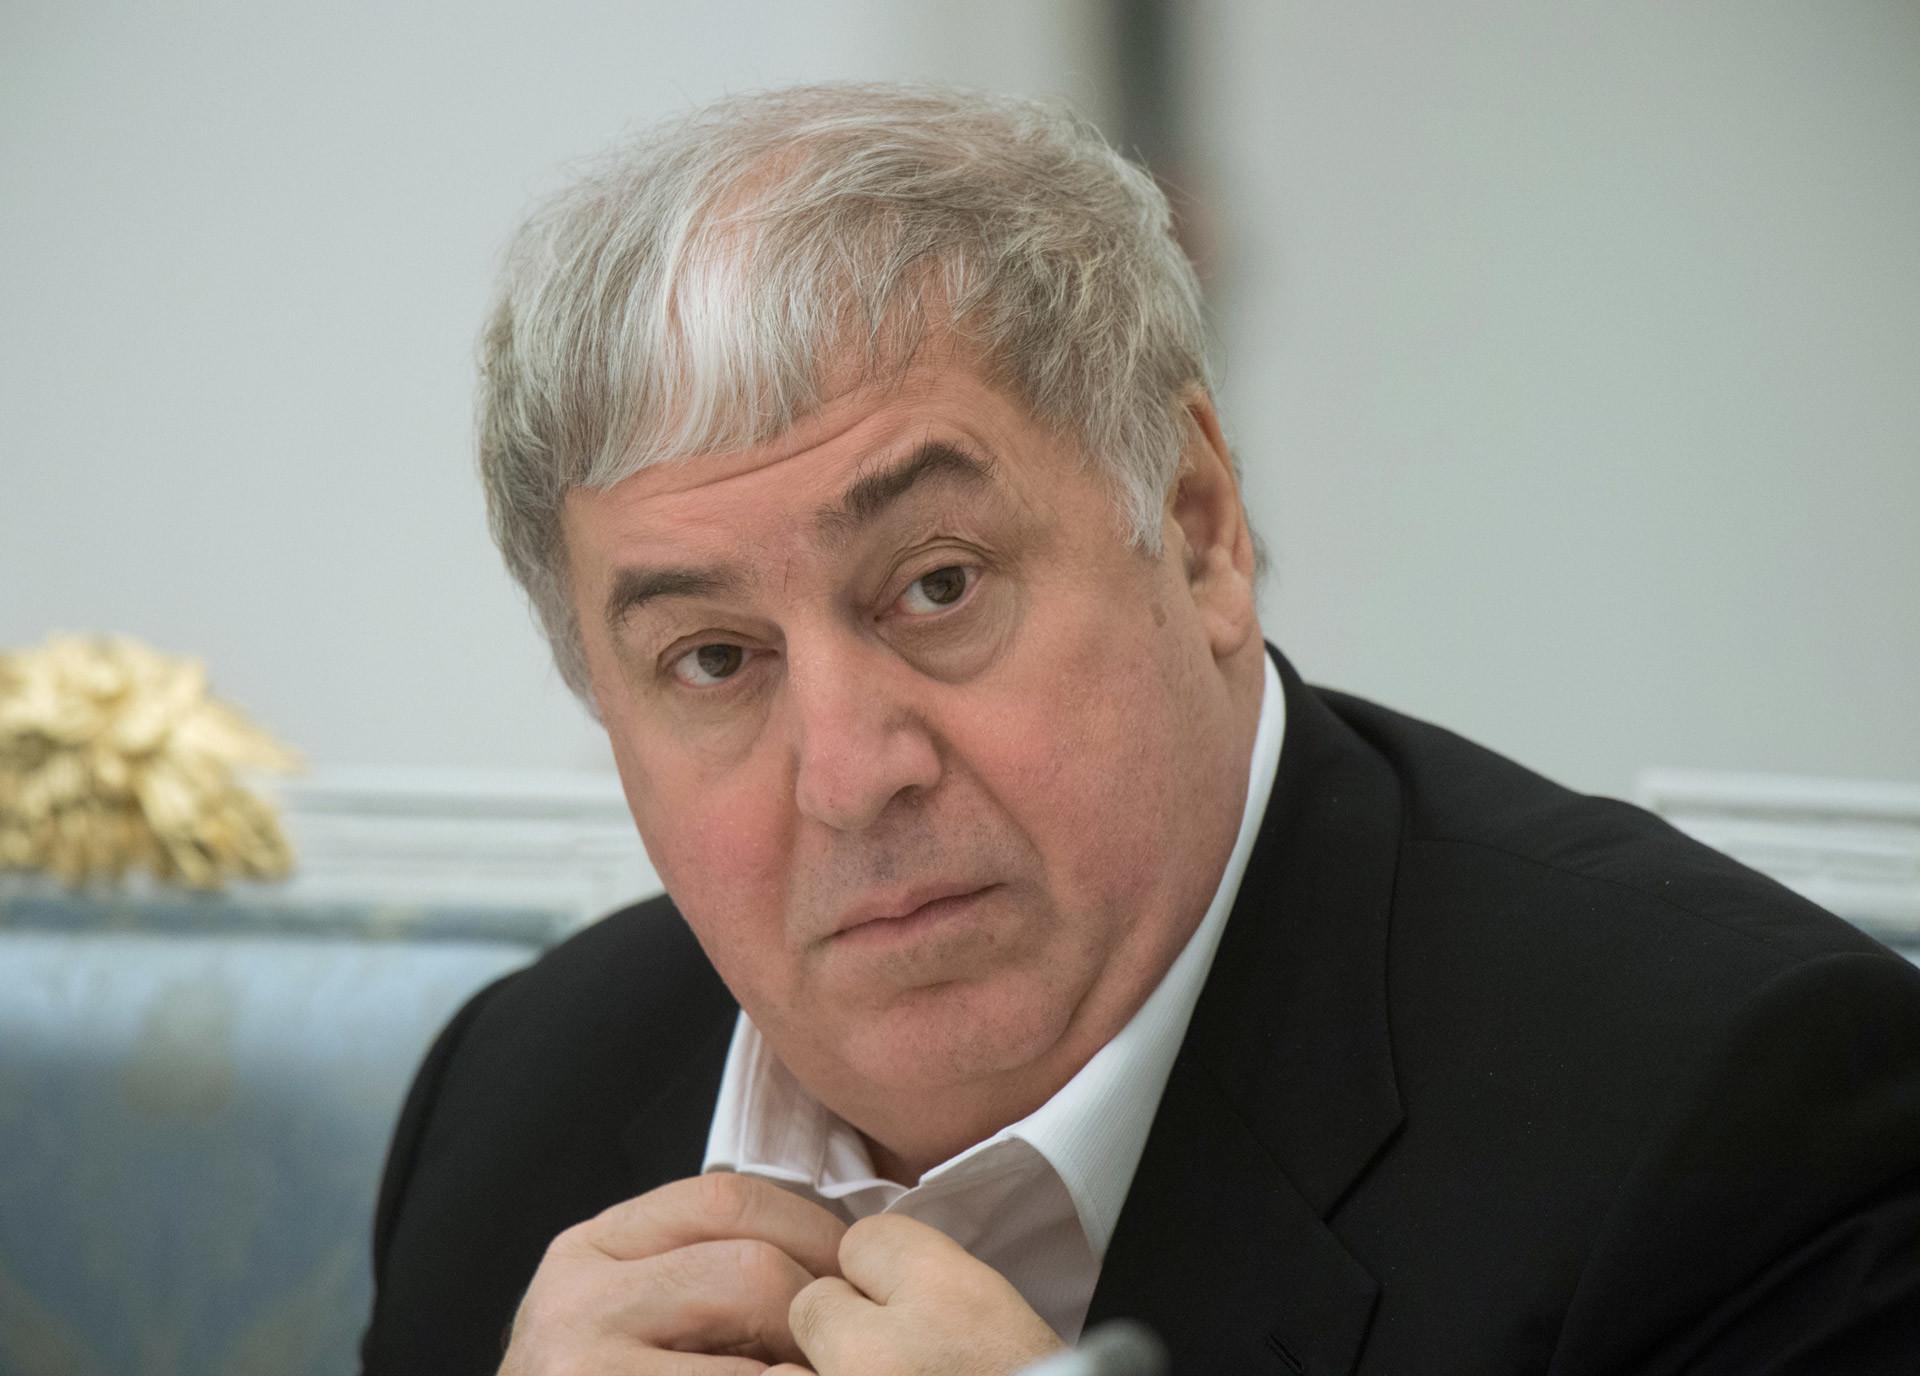 Михаил Гуцериев. Фото: © РИА Новости / Сергей Гунеев